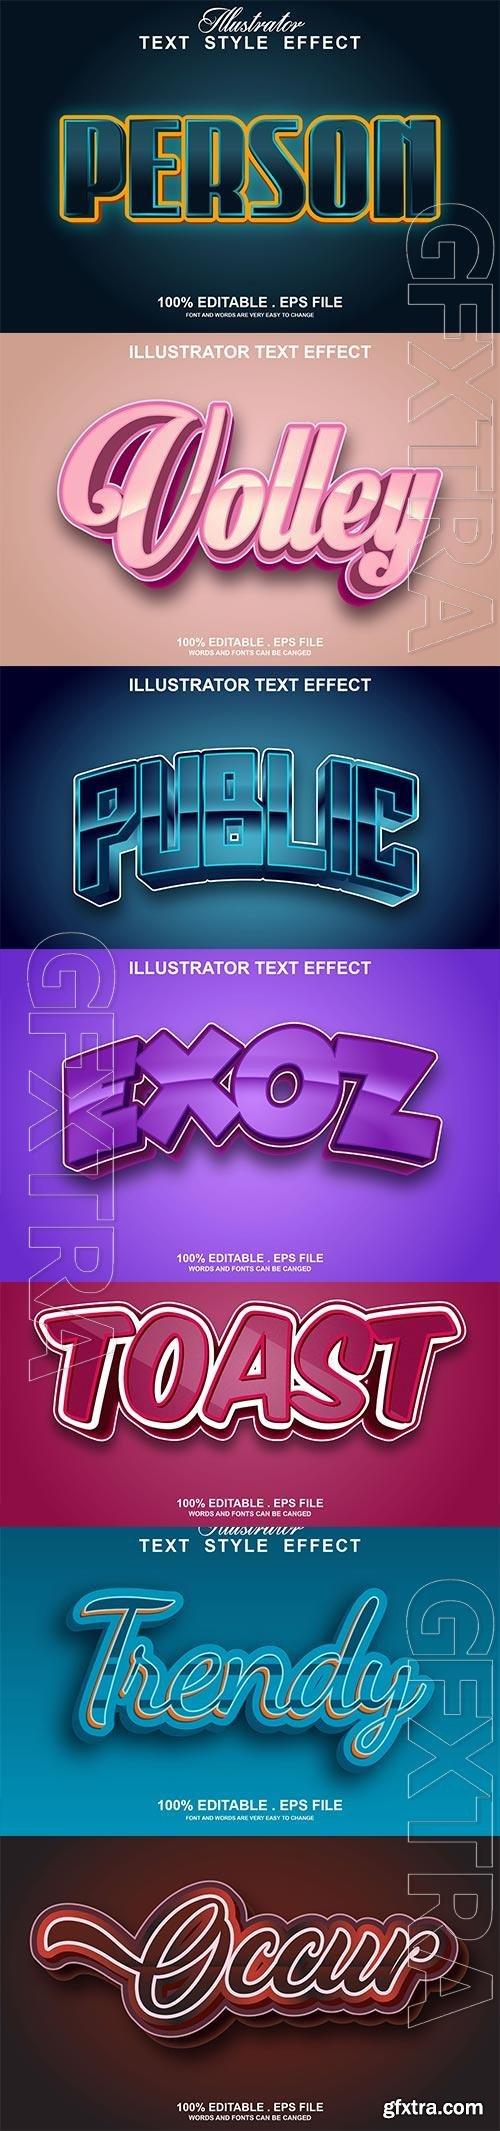 Set 3d editable text style effect vector vol 190